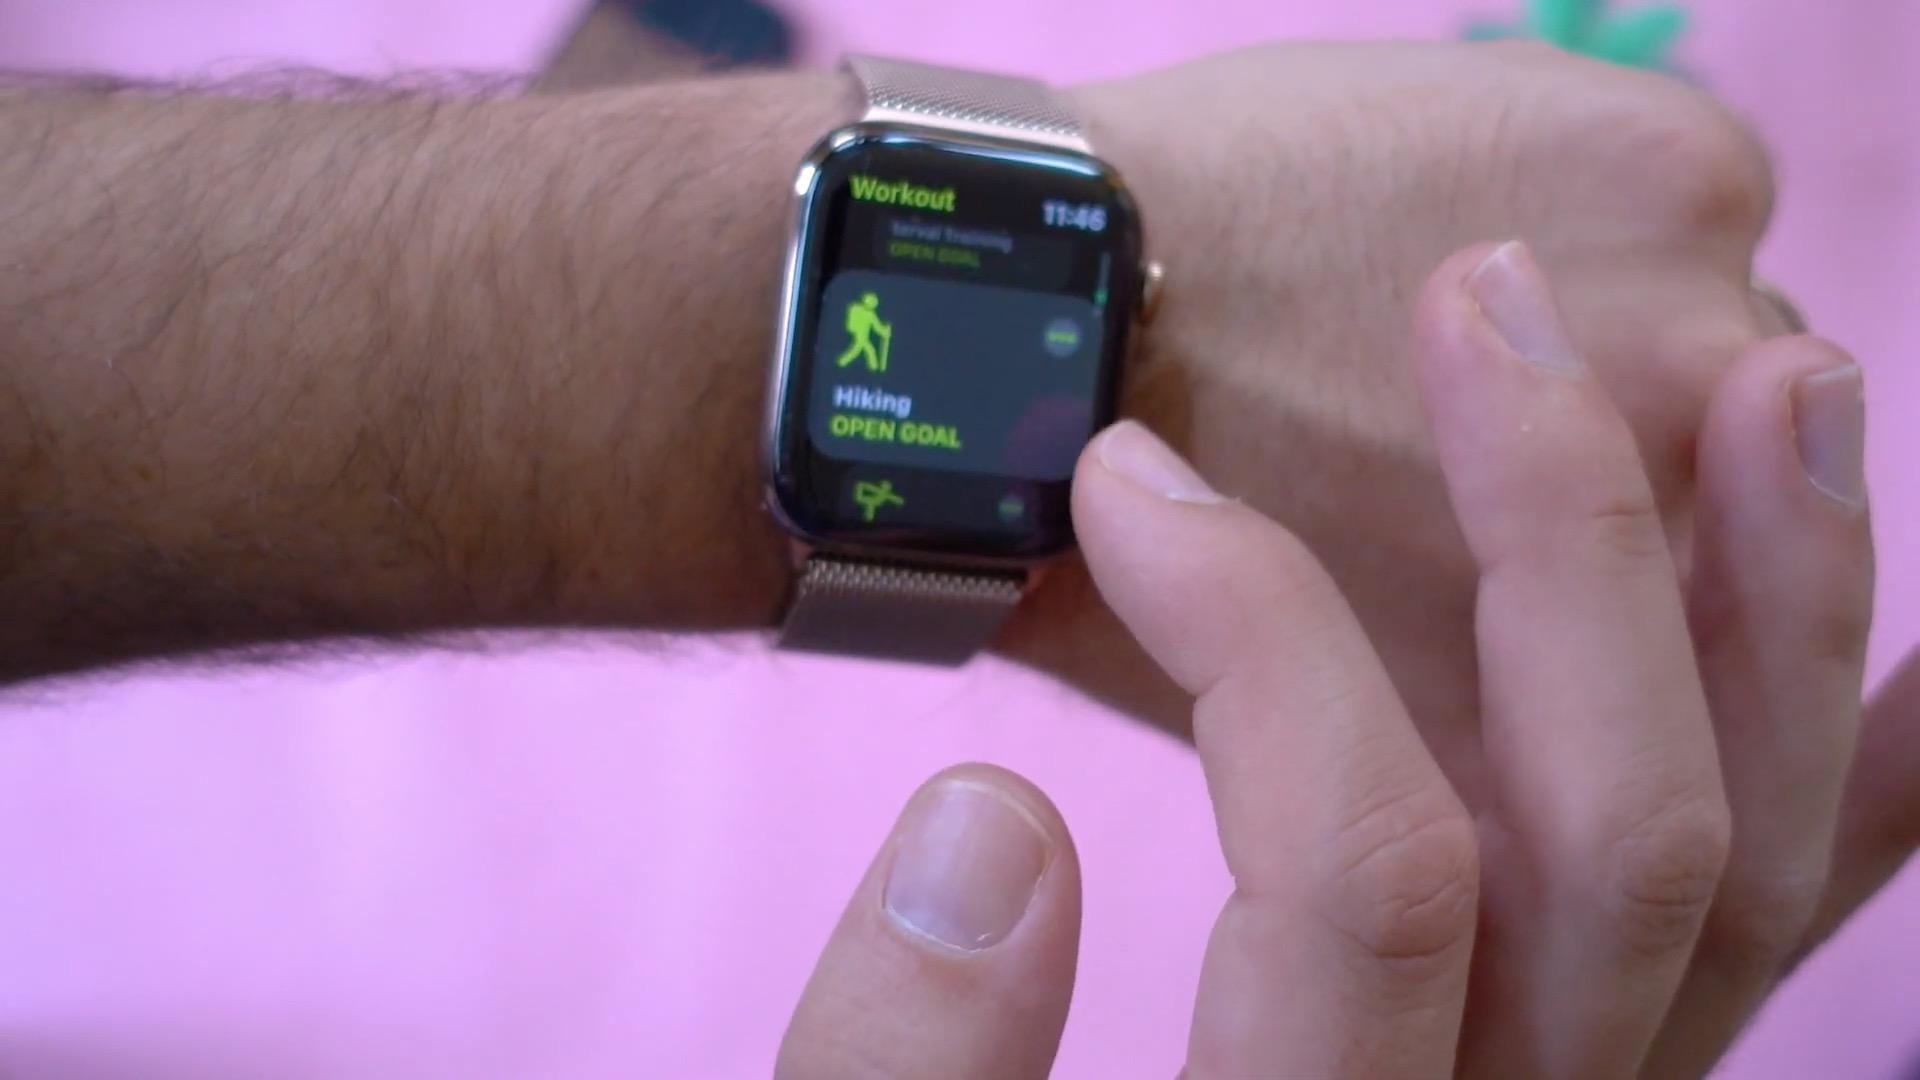 Hiking Workout App Watchos 5